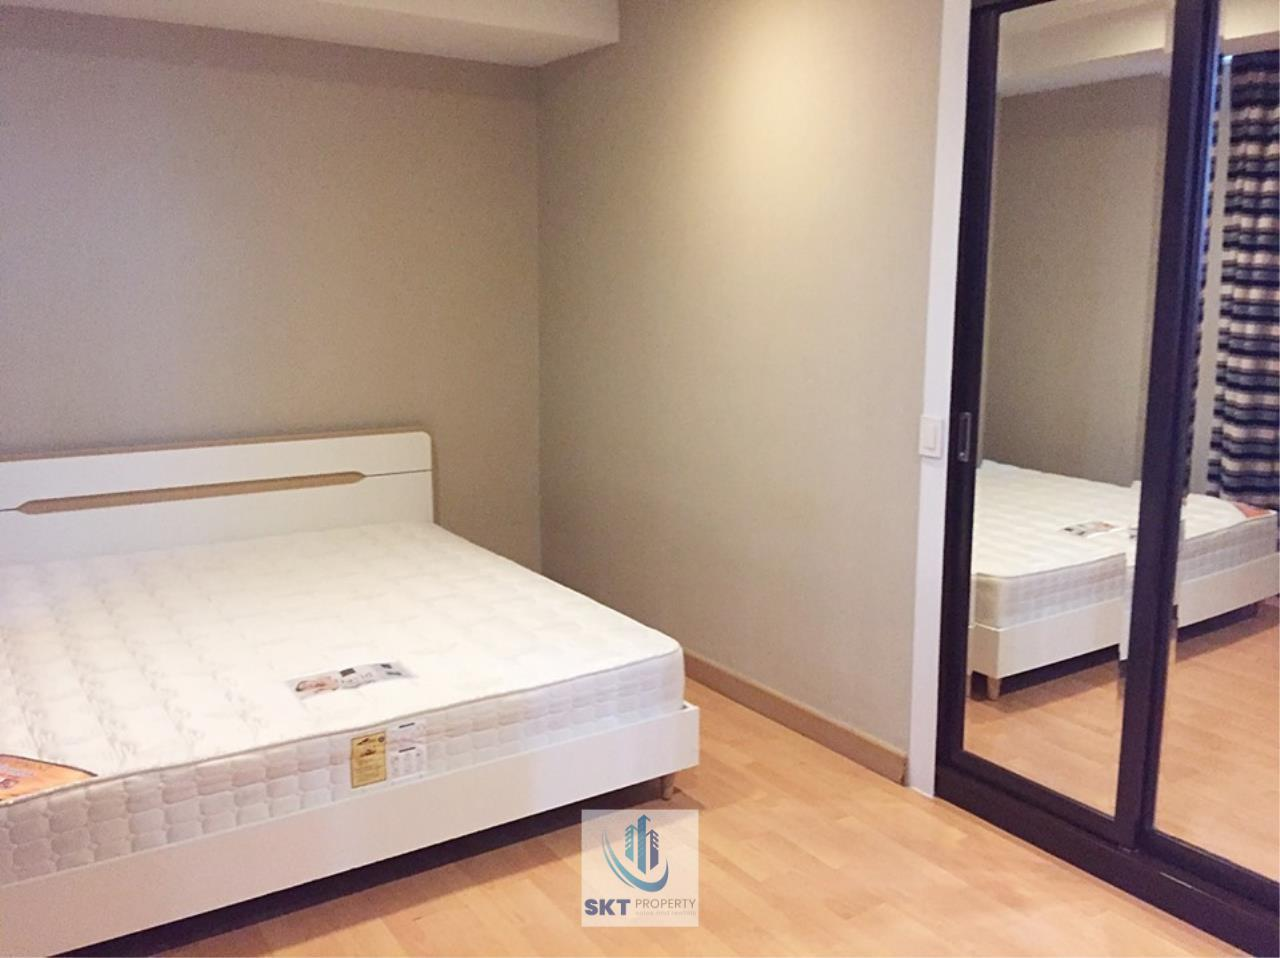 Sukritta Property Agency's Nusasiri grand condo neat BTS Ekamai 14